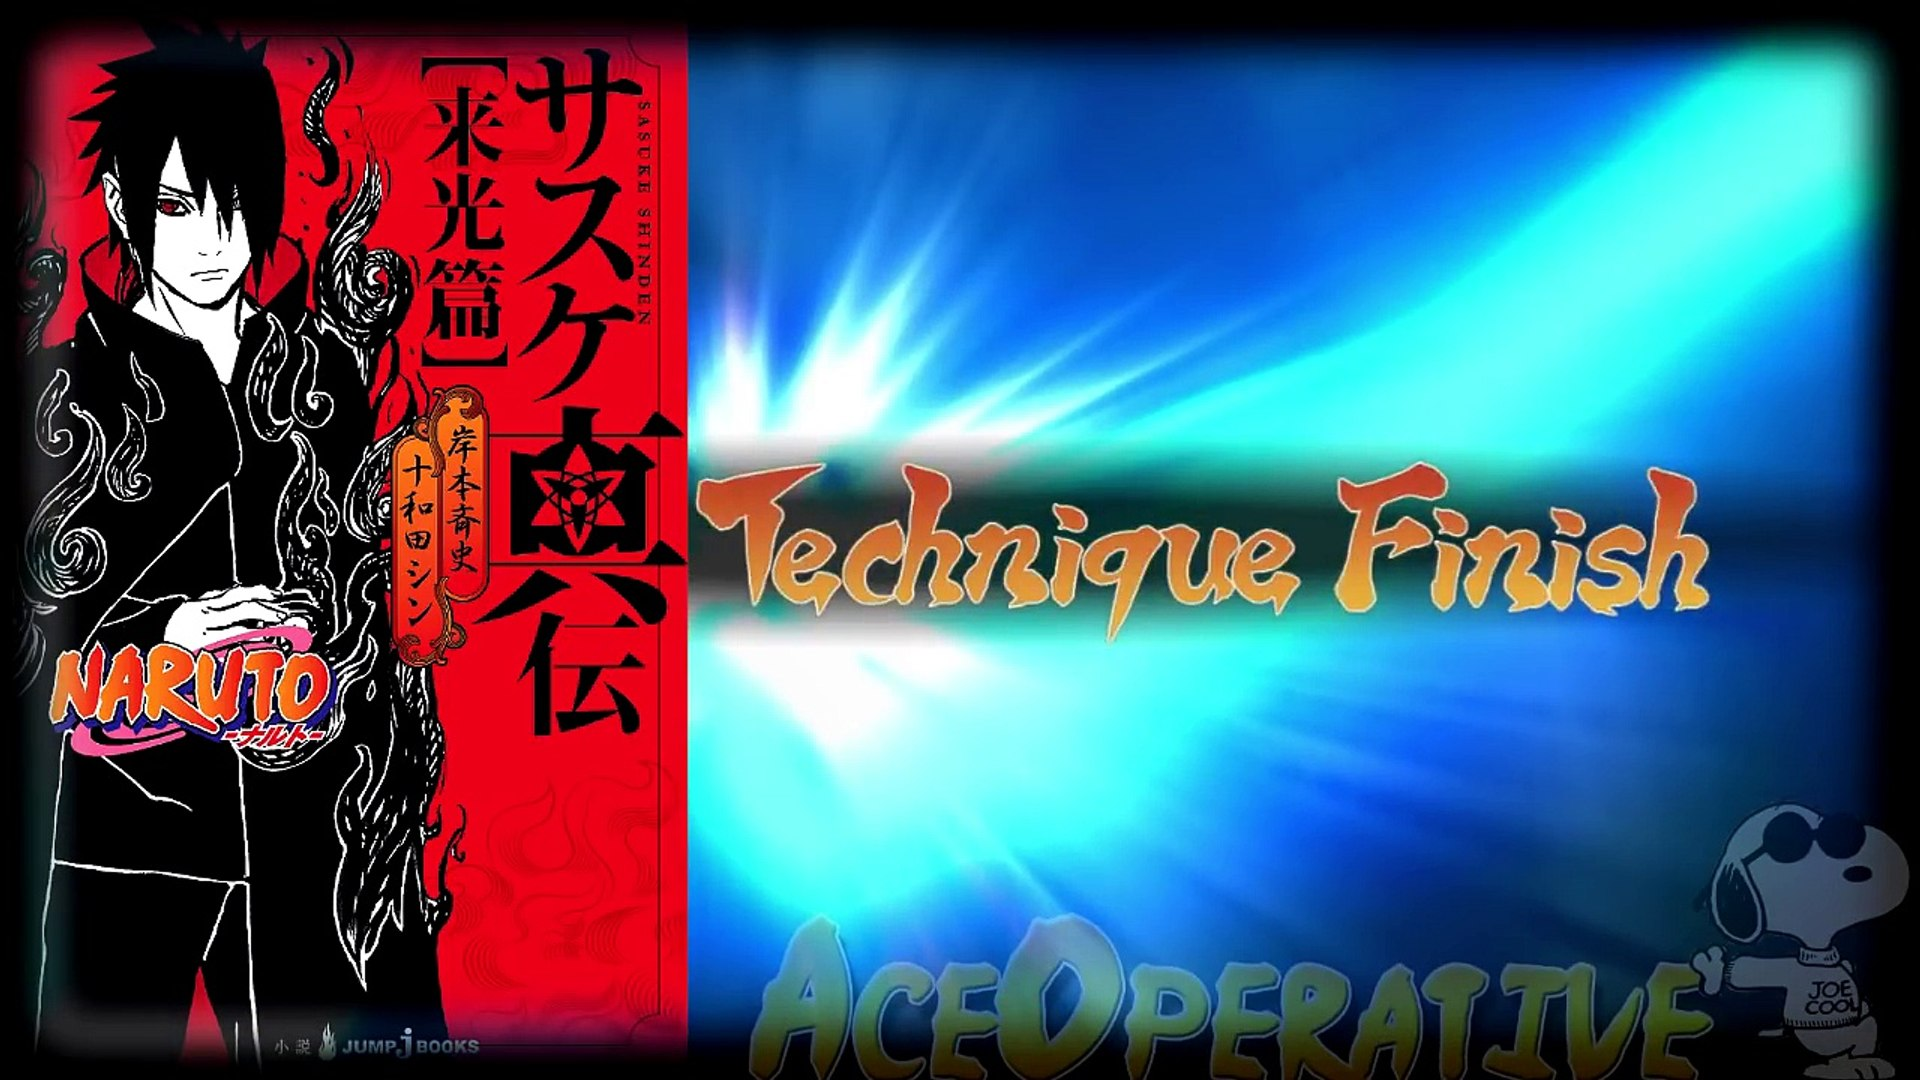 THE END OF FILLER SASUKE STORY INCOMING![Ace Review]Naruto Shippuden Episode 483 Jiraiya a